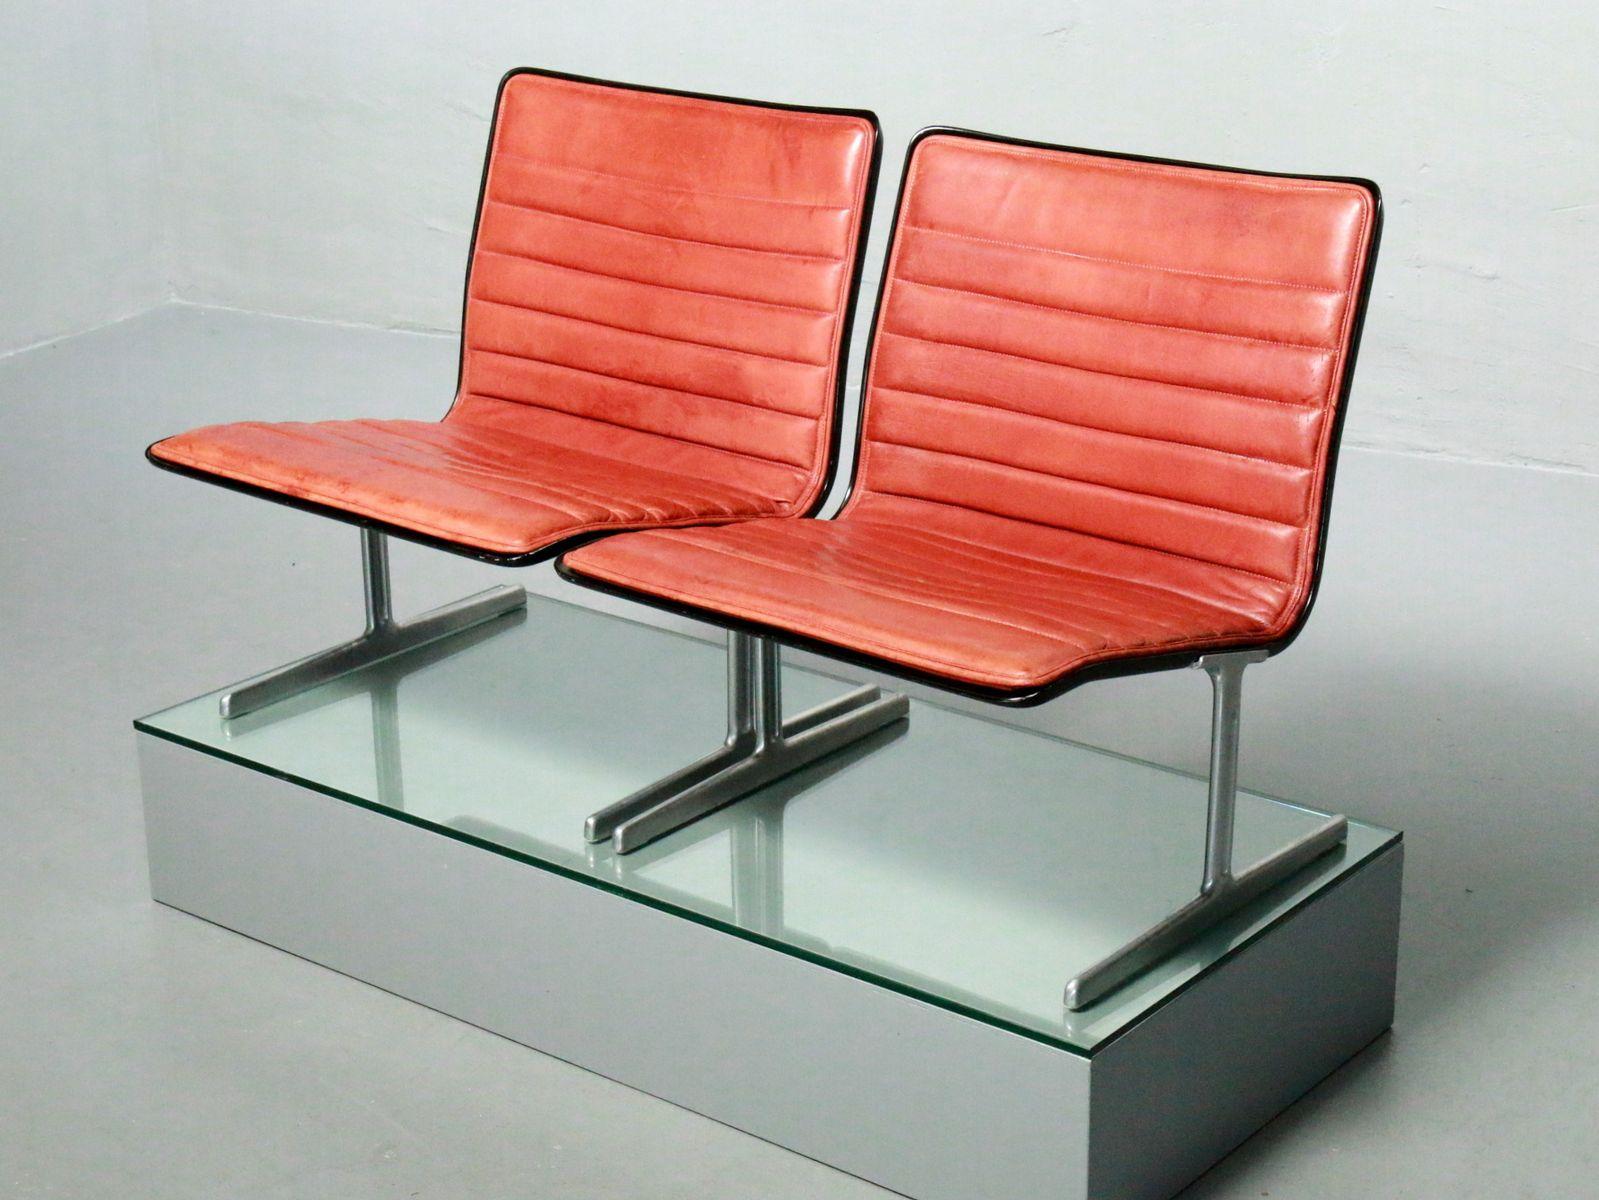 601 rz 60 sessel von dieter rams f r vitsoe zapf 1960er 2er set bei pamono kaufen. Black Bedroom Furniture Sets. Home Design Ideas